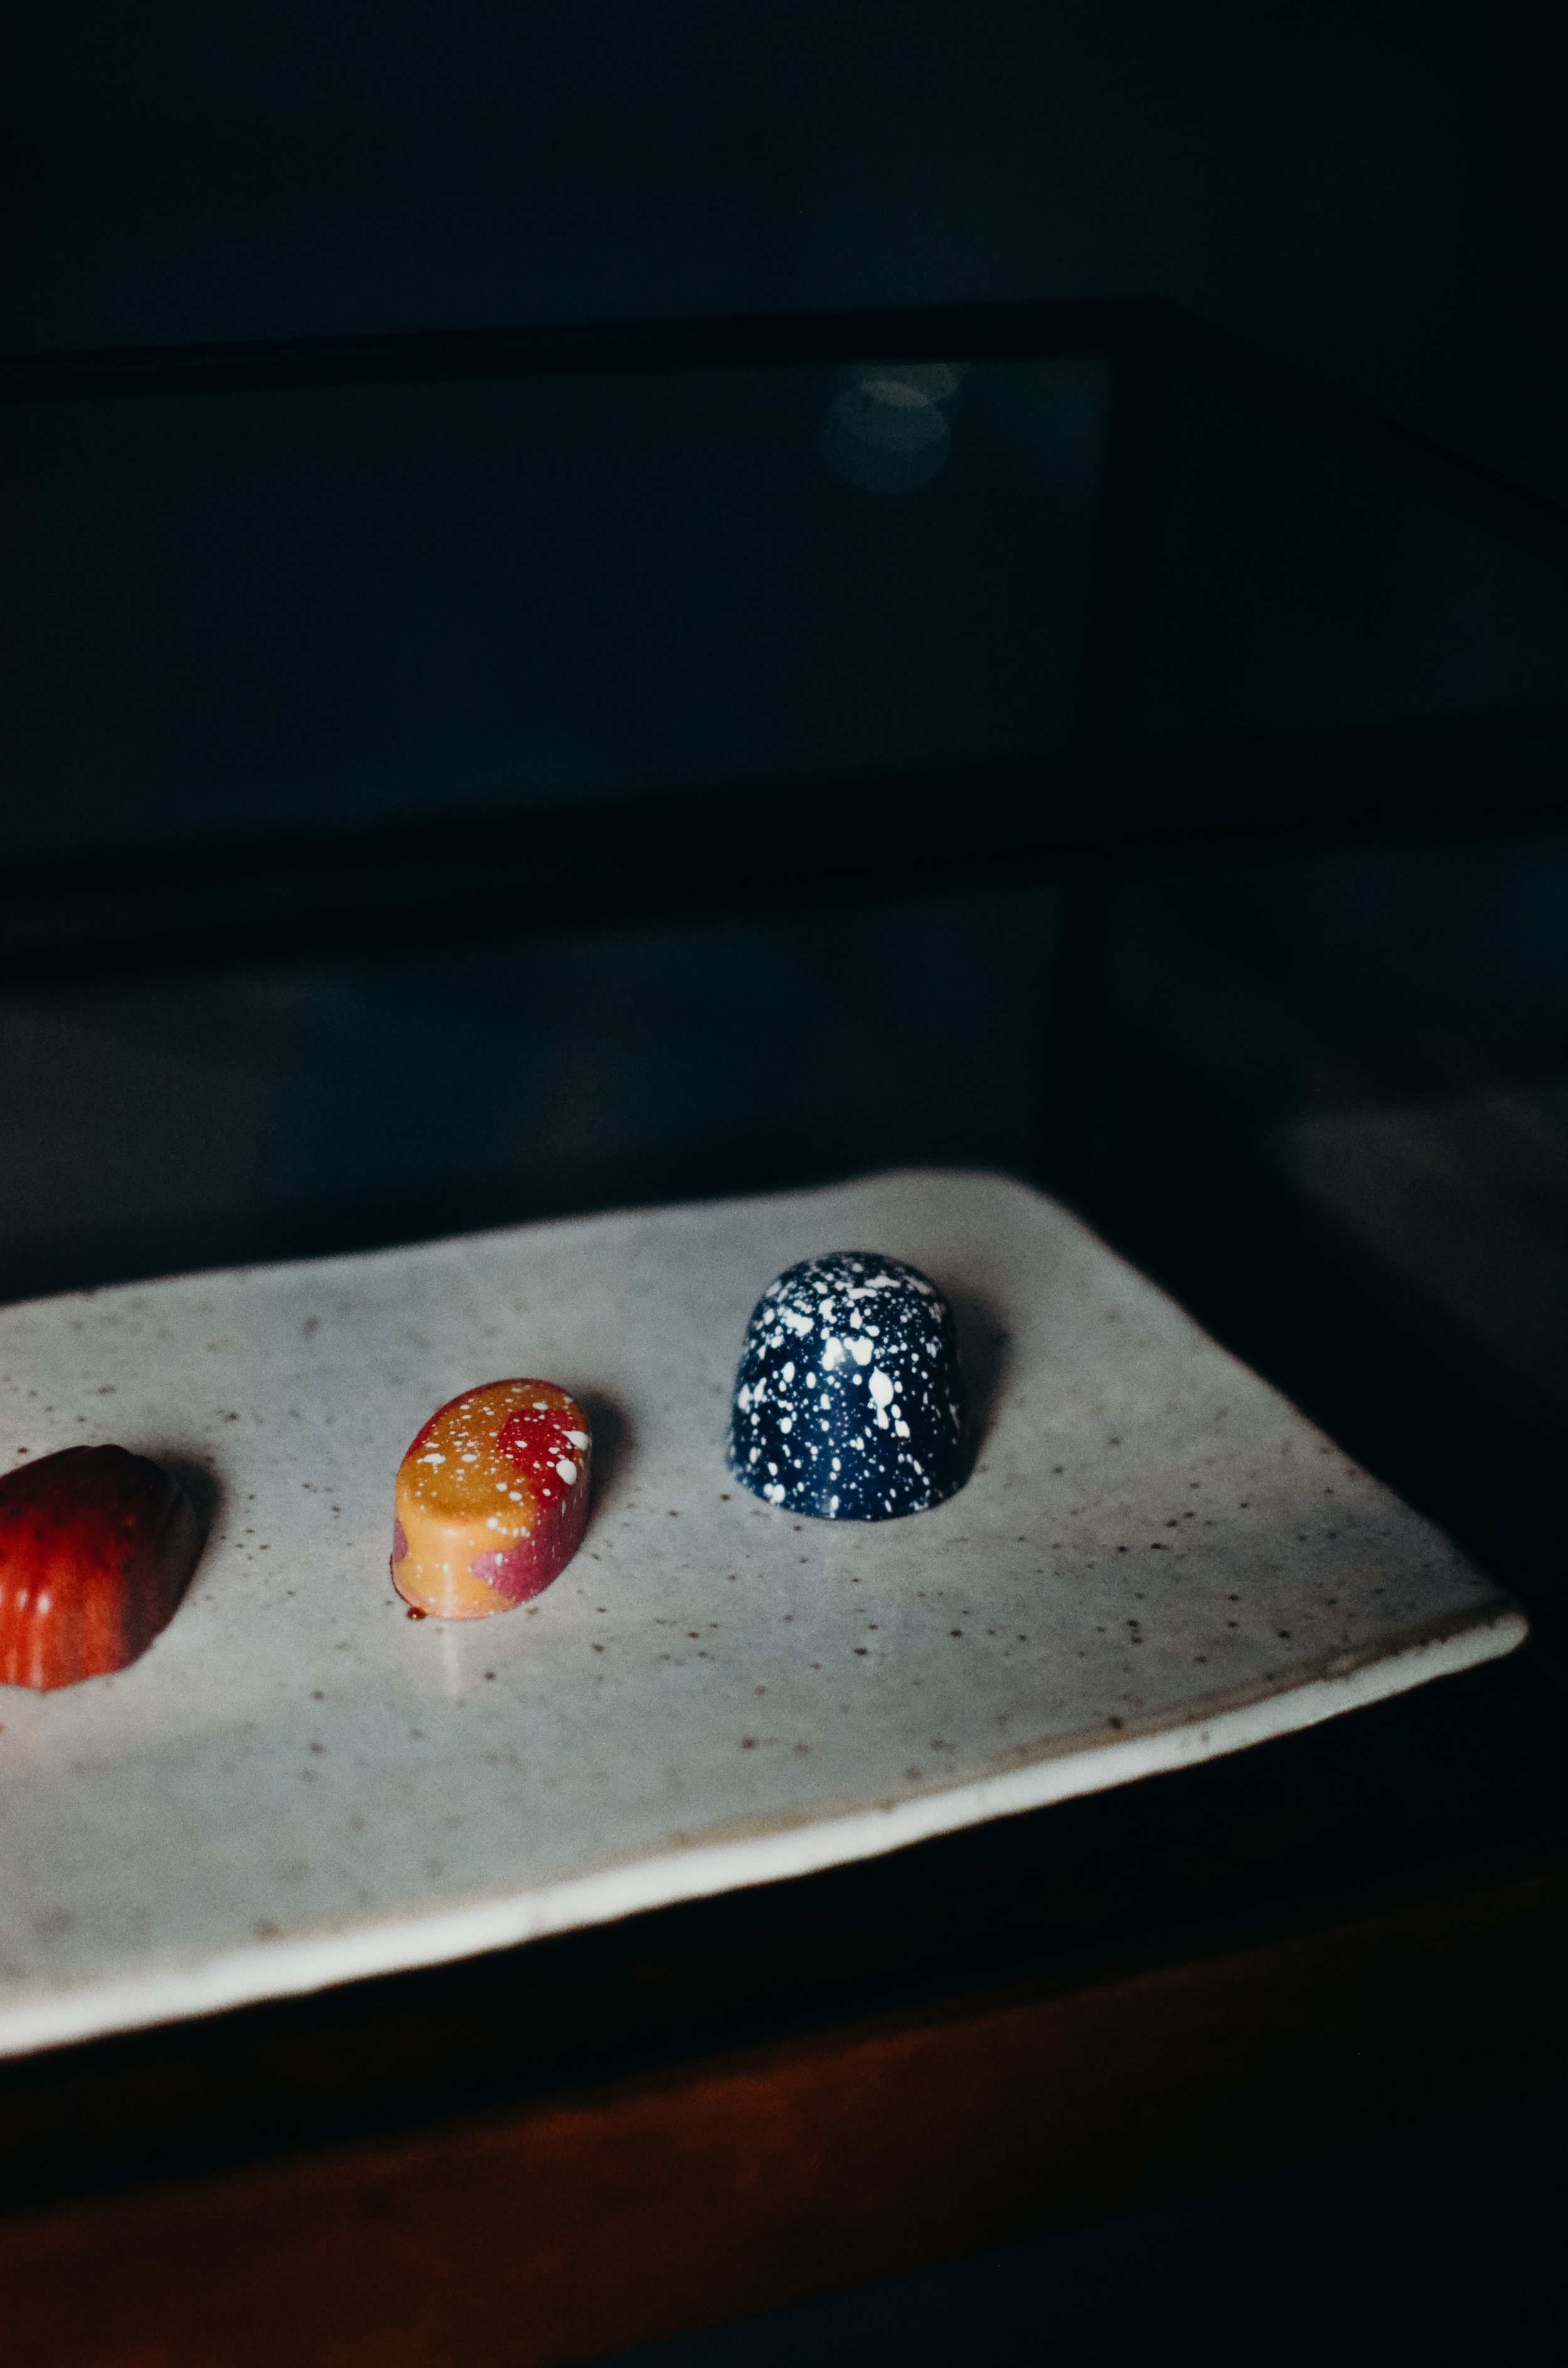 Wendling_Boyd_Buy_Nearby_Mokaya_Chocolate-13.jpg